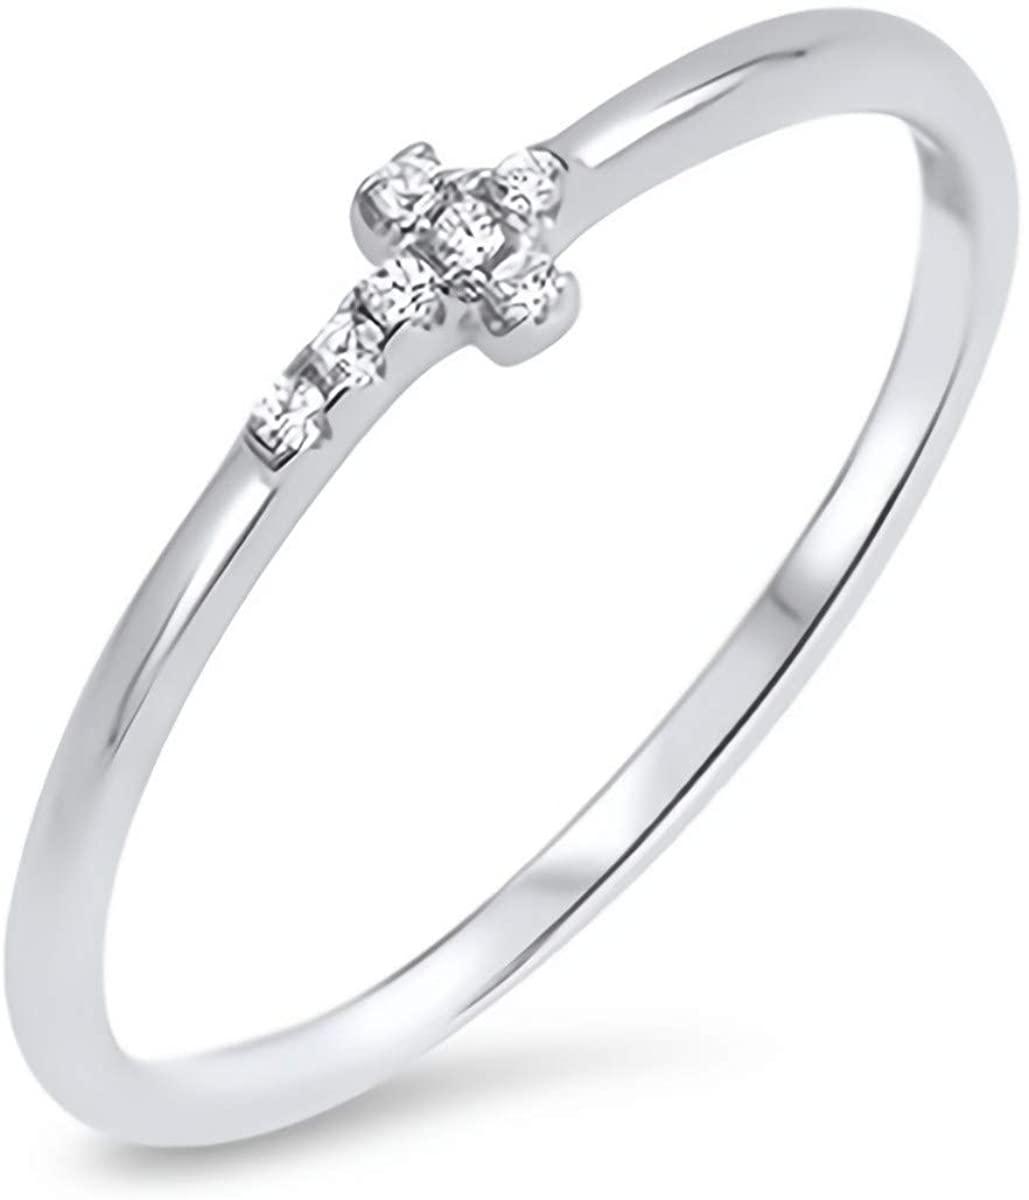 Glitzs Jewels 925 Sterling Silver CZ Ring (Clear/Sideways Cross) | Cubic Zirconia Jewelry Gift